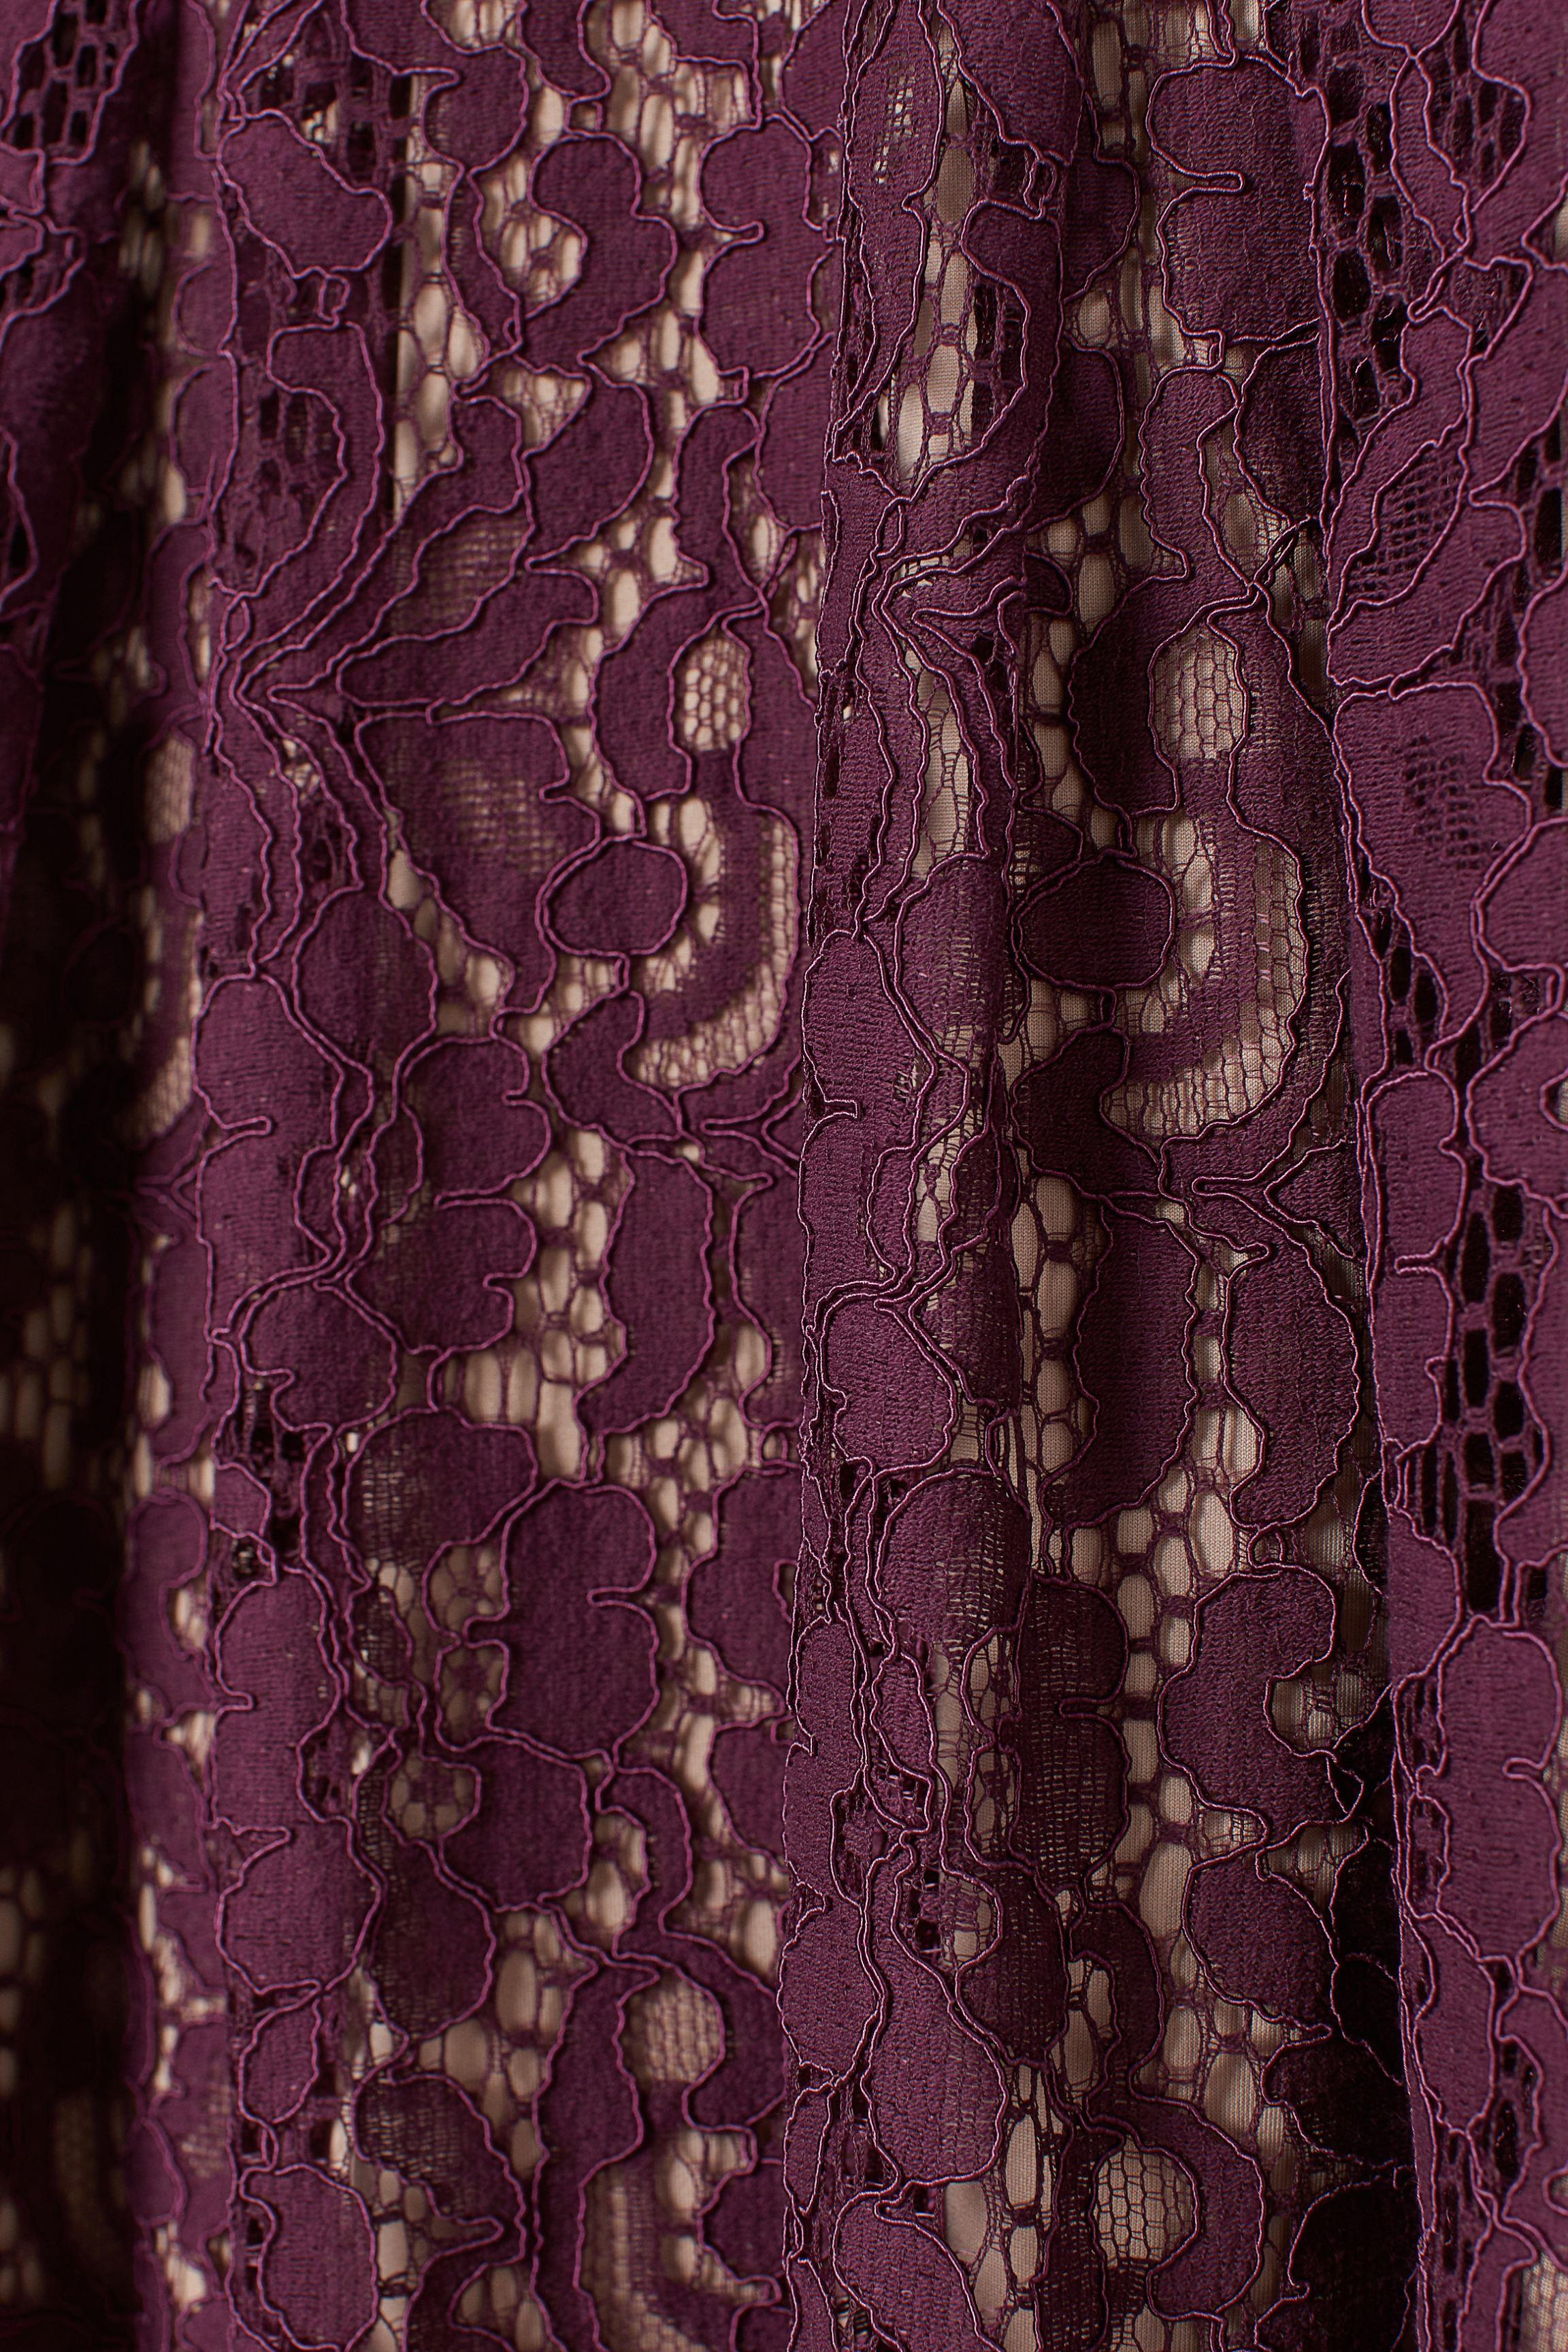 H&M+ Calf-length Lace Dress